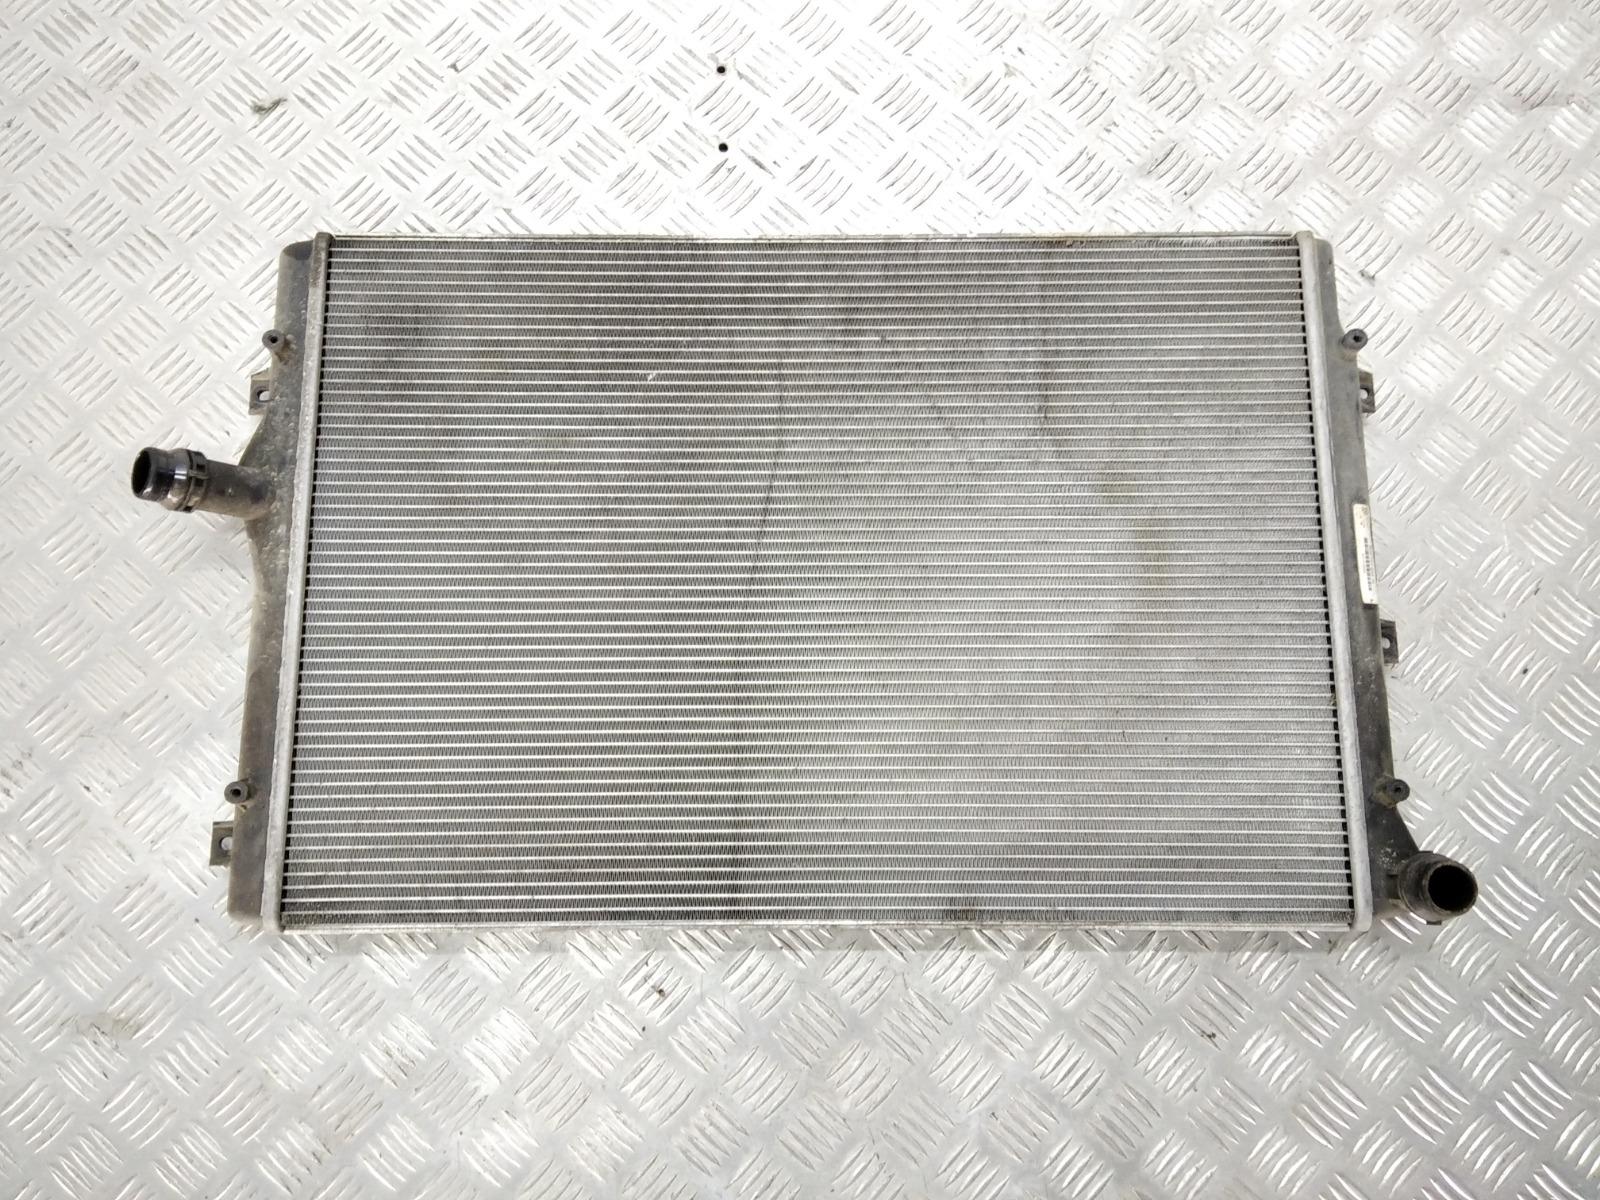 Радиатор (основной) Volkswagen Passat B6 2.0 TDI 2008 (б/у)